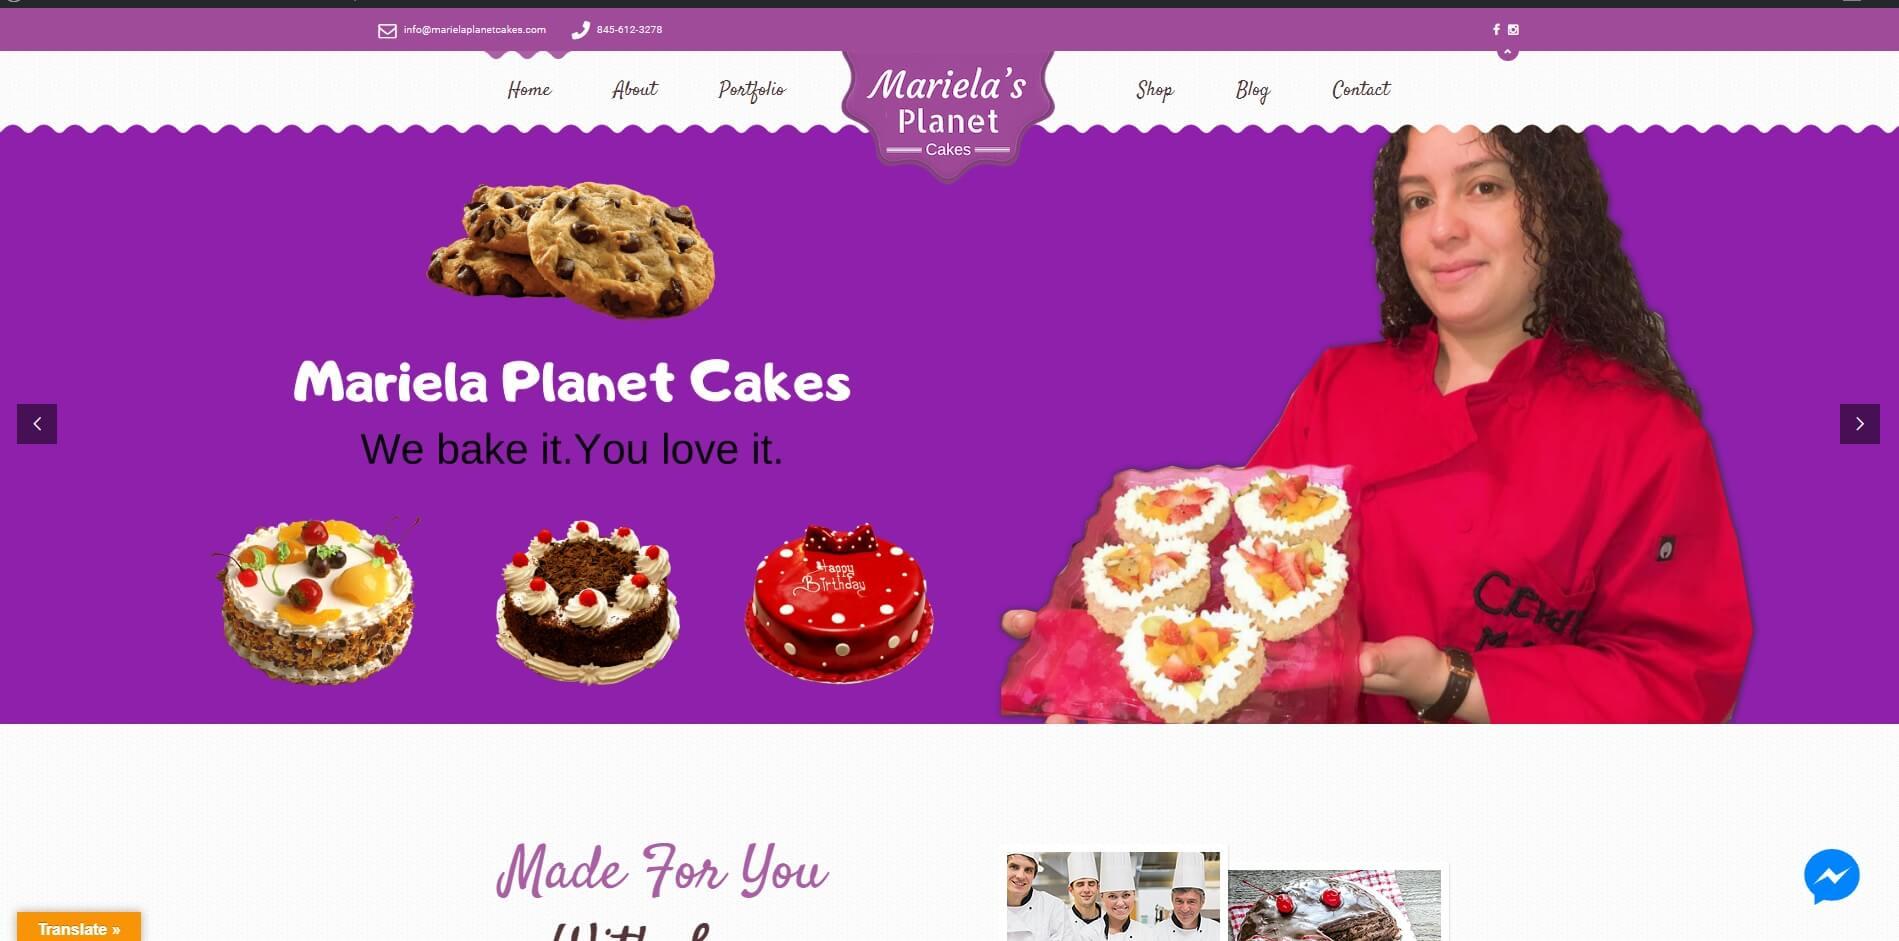 Mariela's Planet Cakes